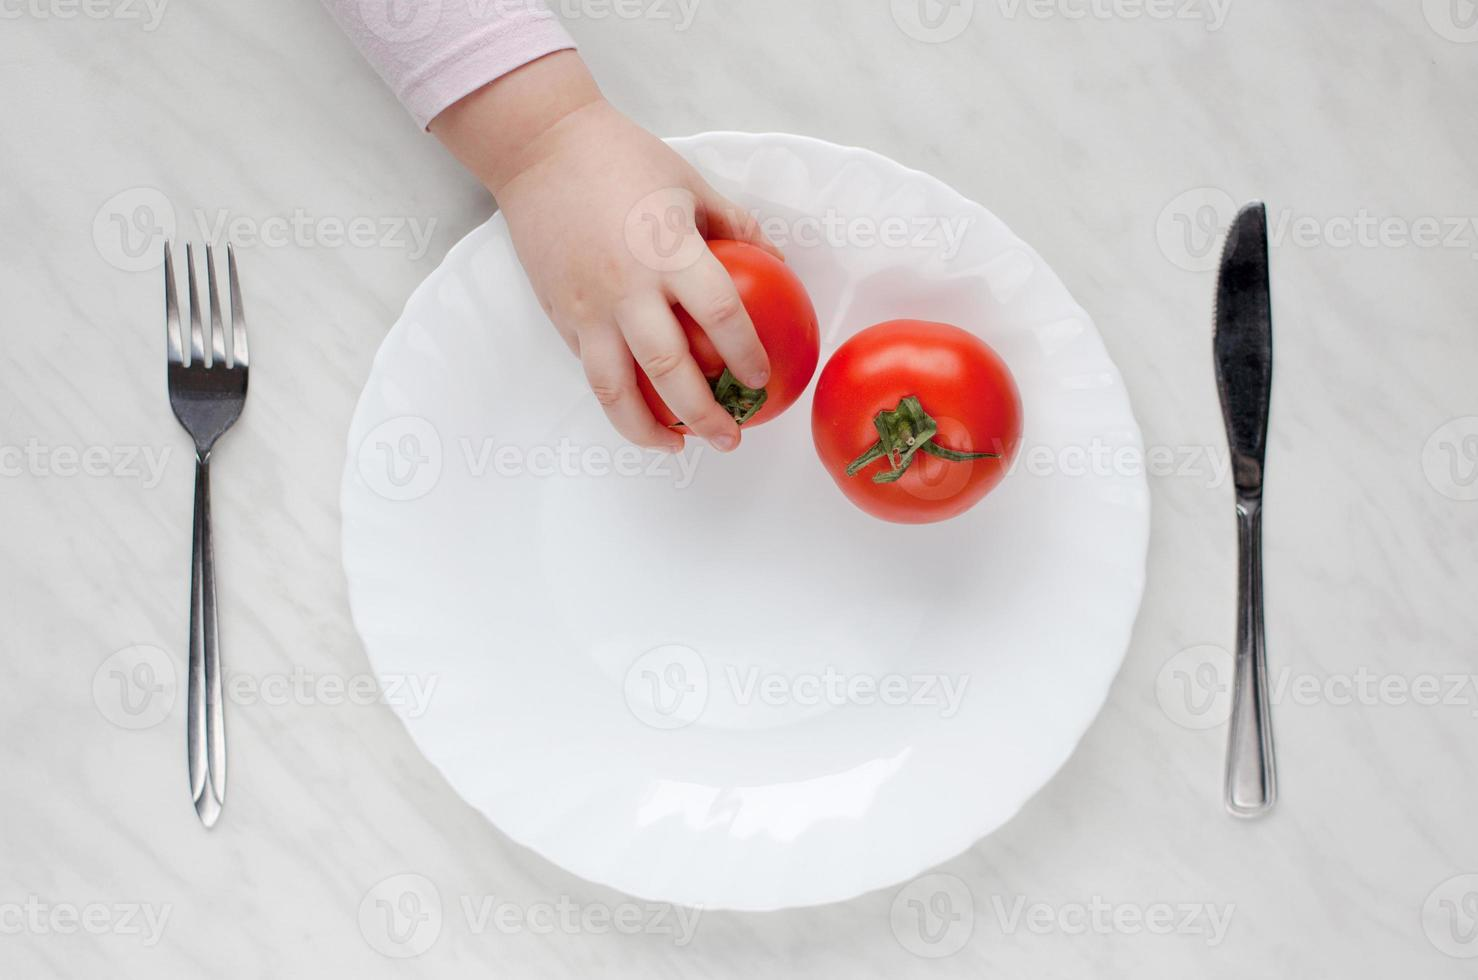 tomate en mano foto